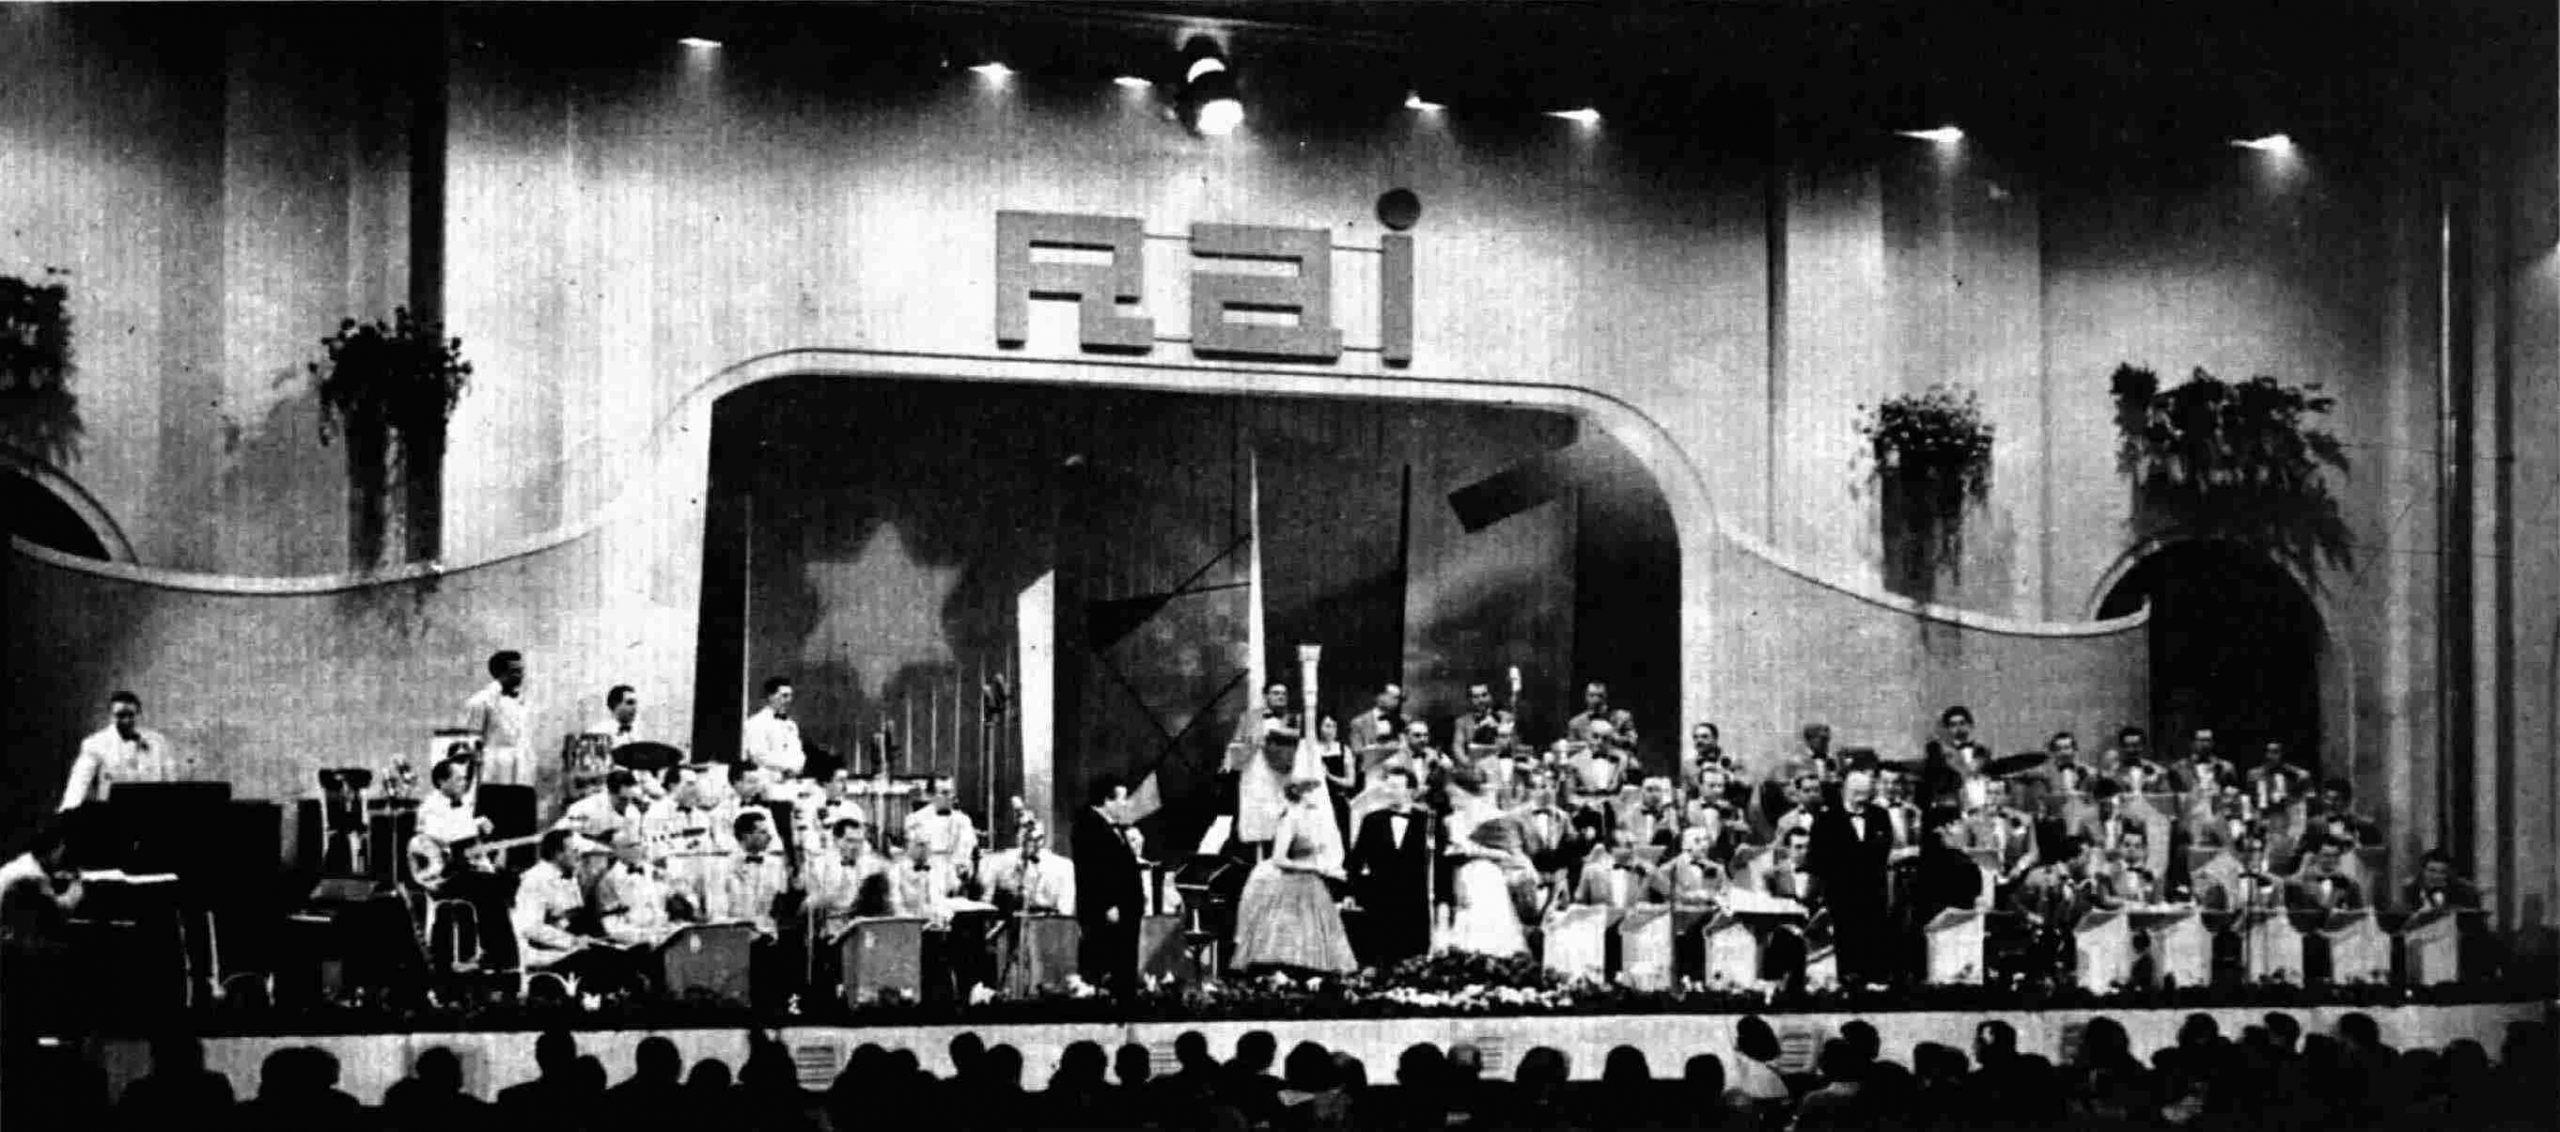 San-Remo-Festival 1957: Kein Entkommen